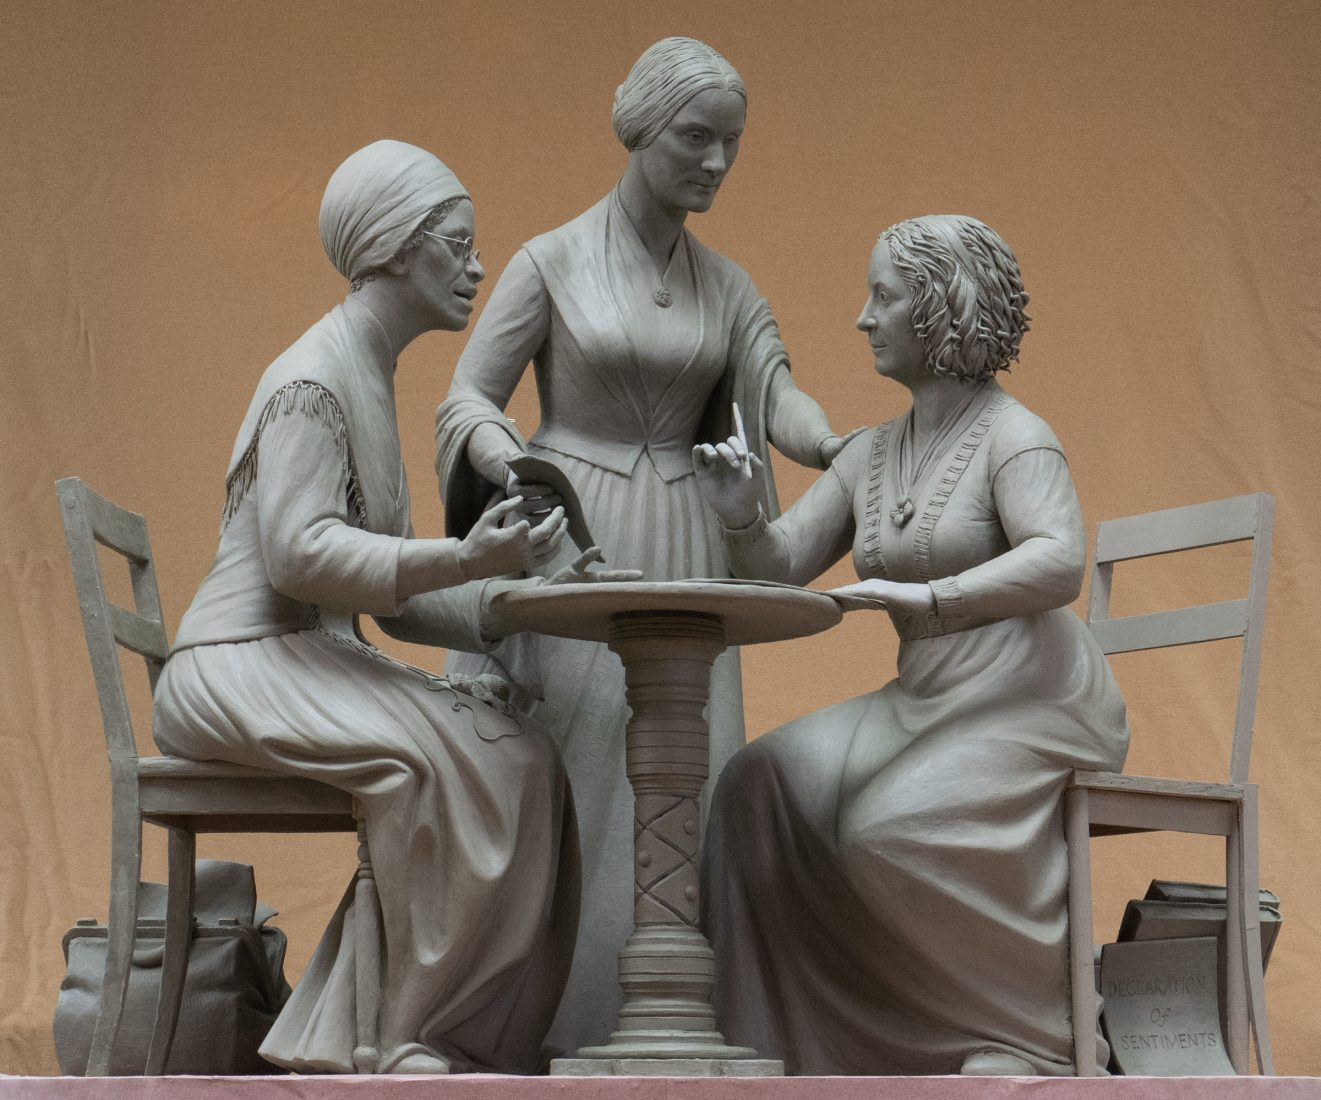 Pioneering Women in New York City